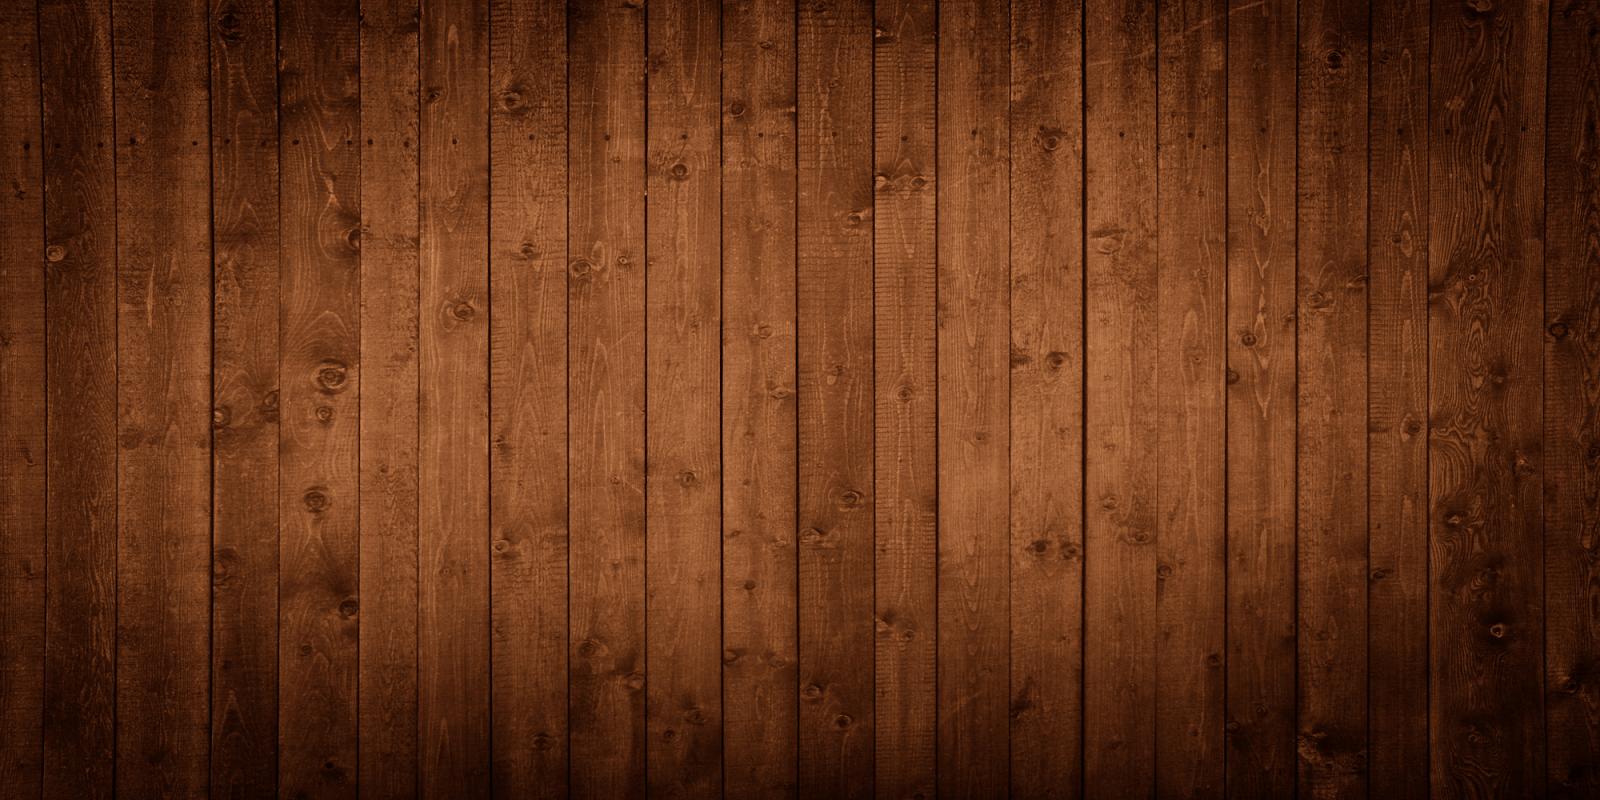 Wooden texture background hd